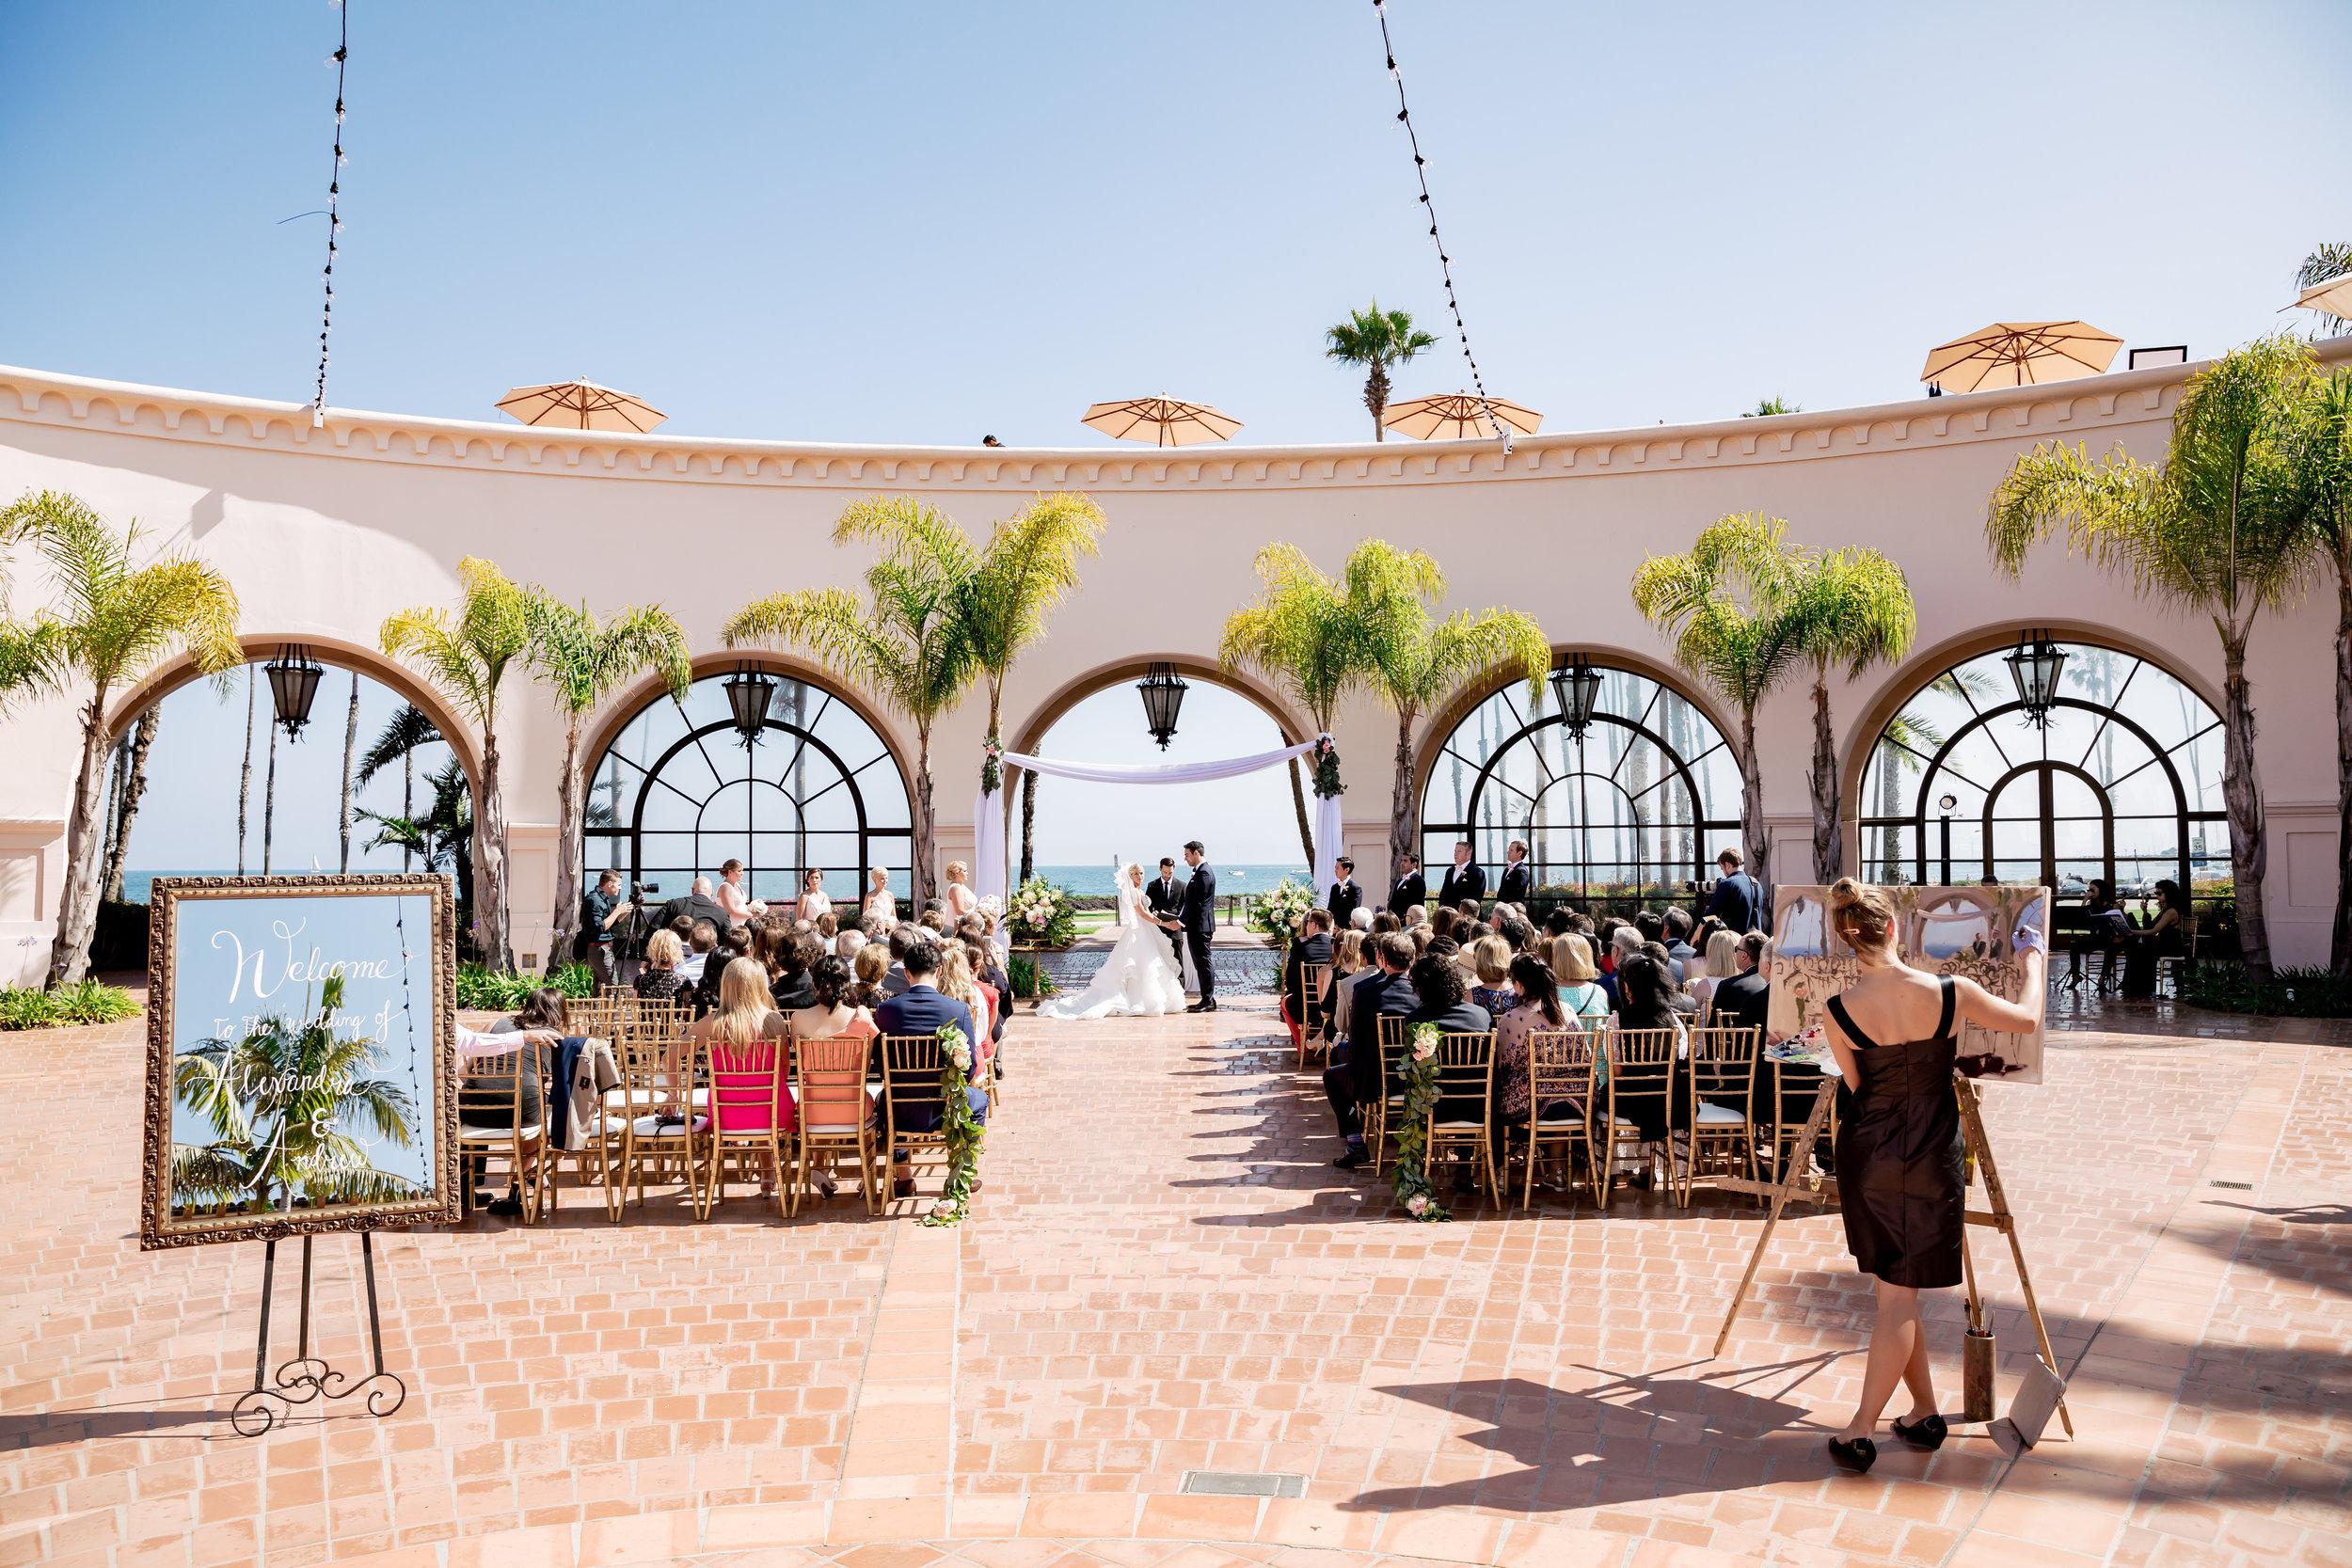 www.santabarbarawedding.com   Rewind Photography   Hilton Santa Barbara Beachfront Resort   Events by M and M   Ceremony